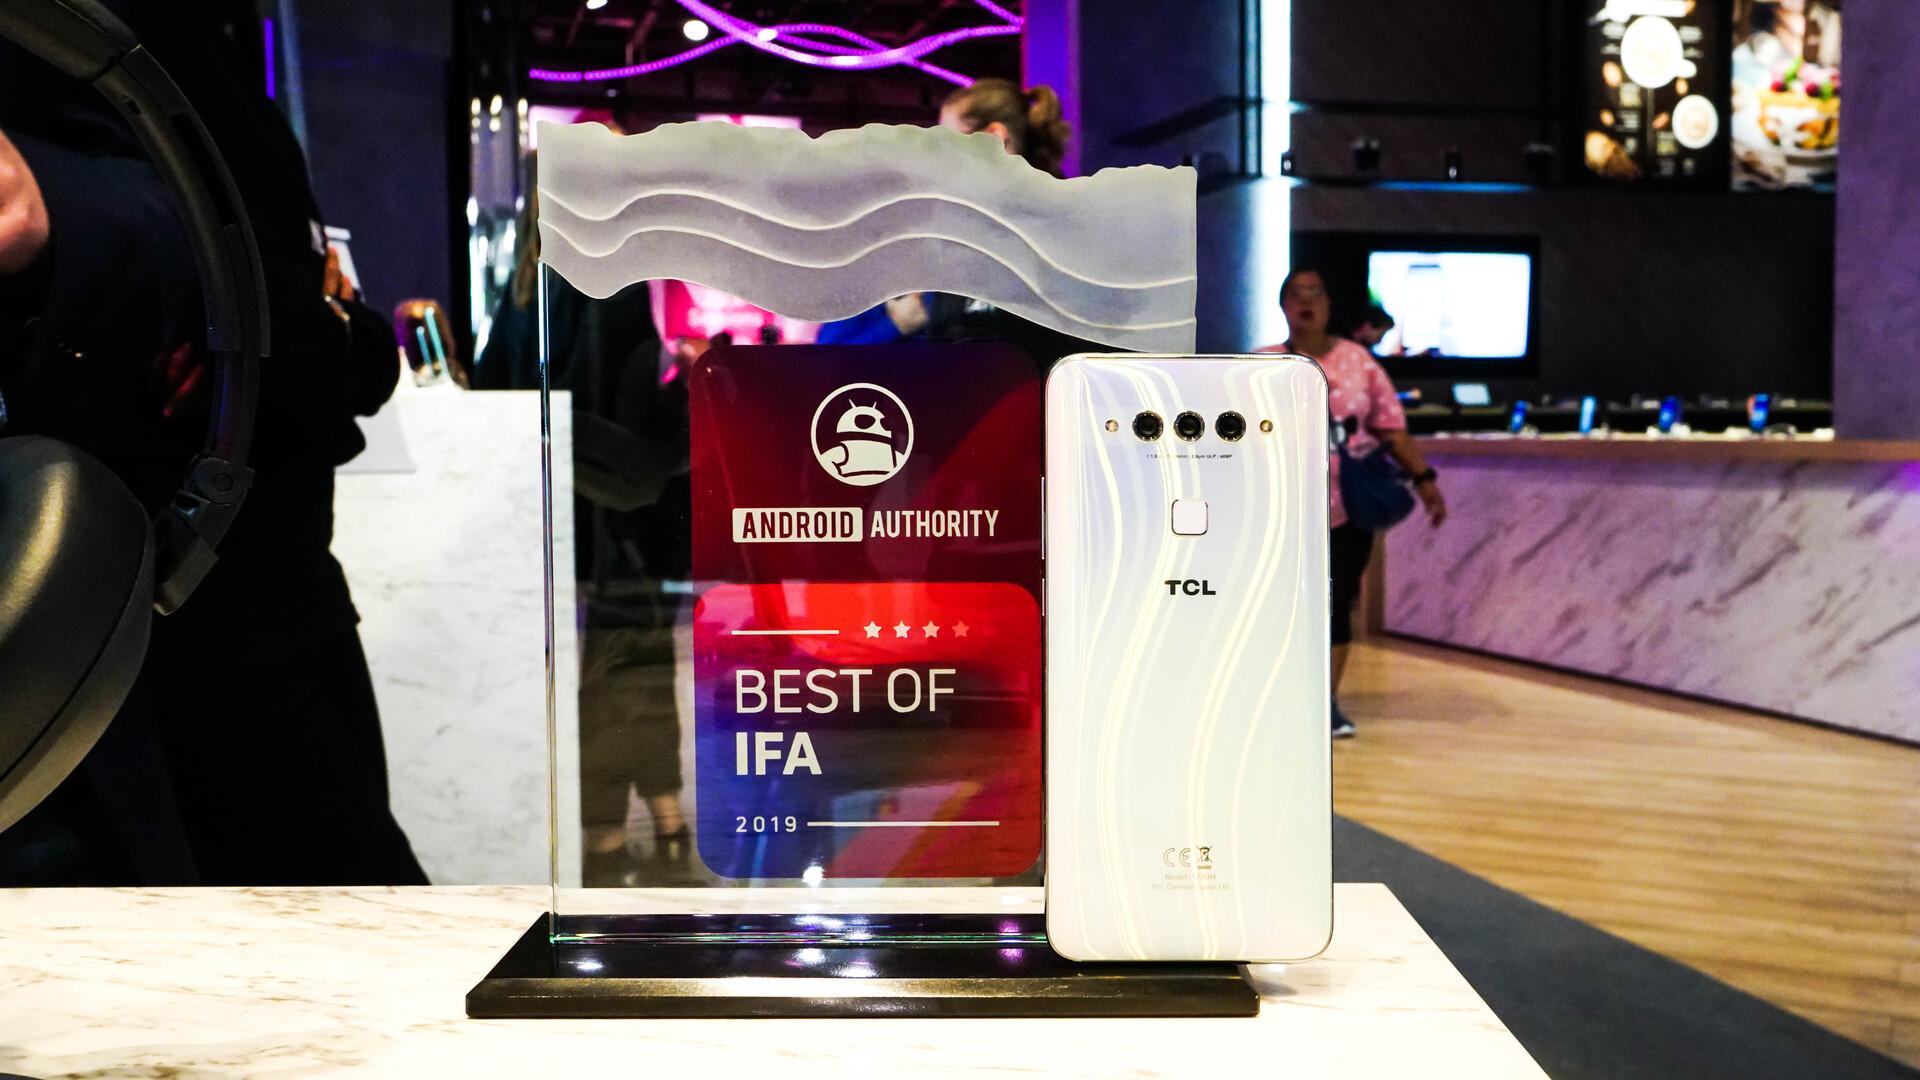 TCL Plex Android Authority IFA Award 3